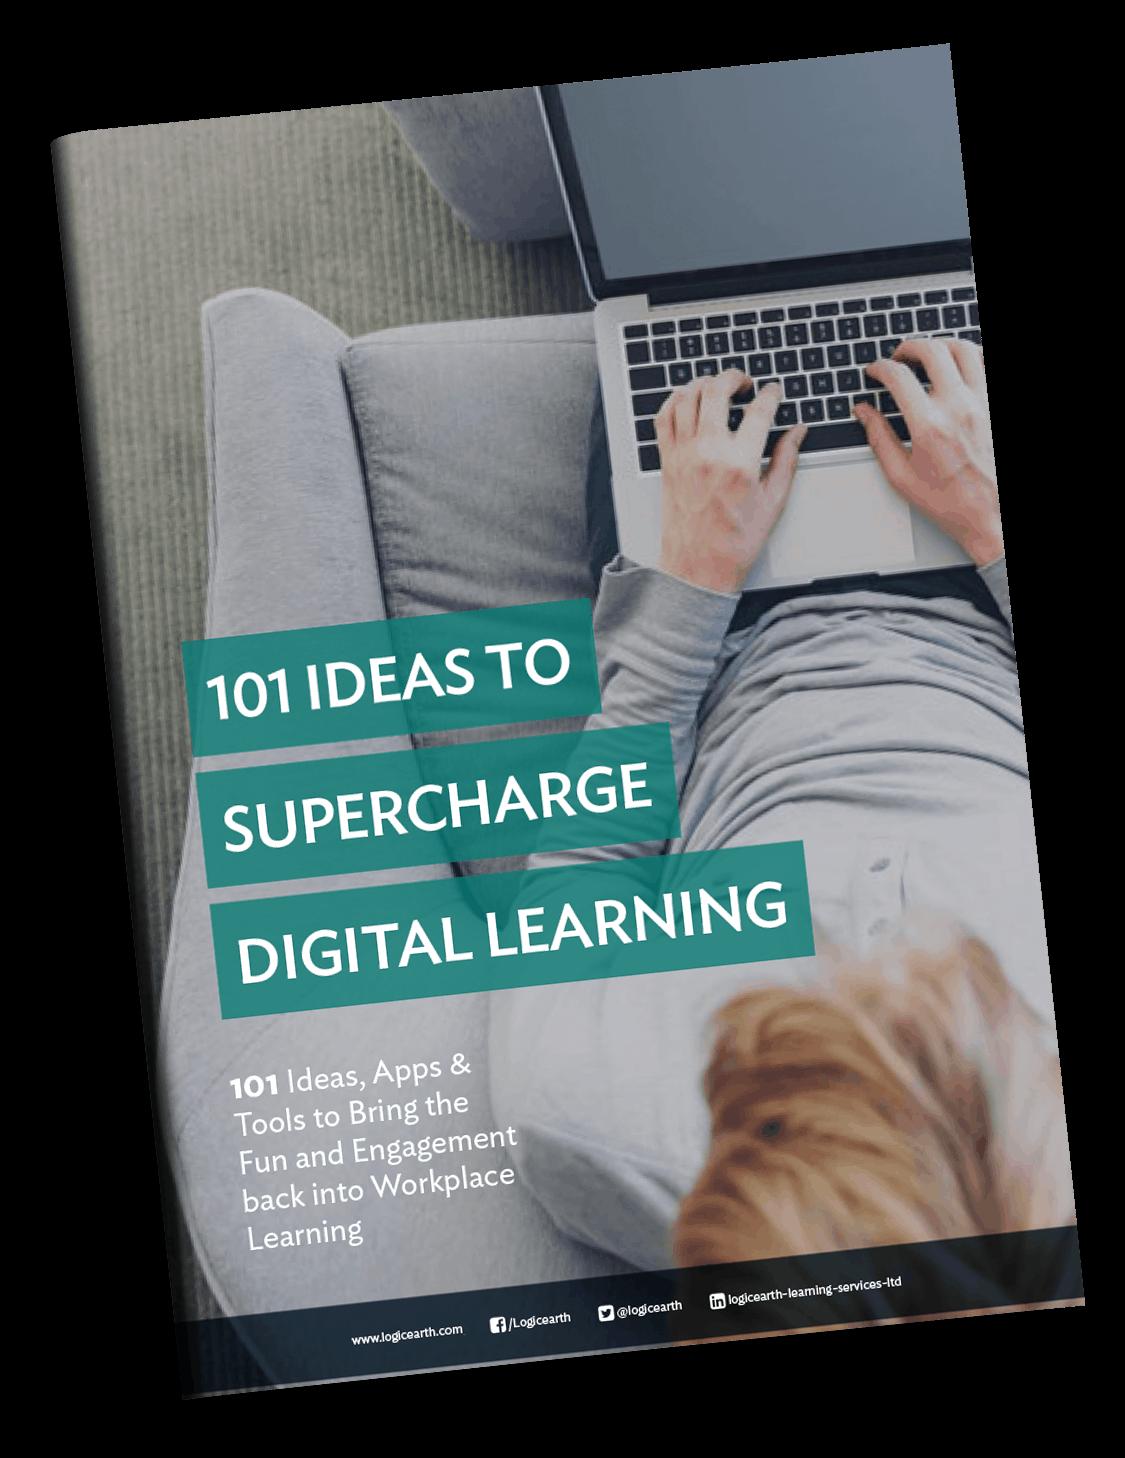 101 ways to make digital learning fun